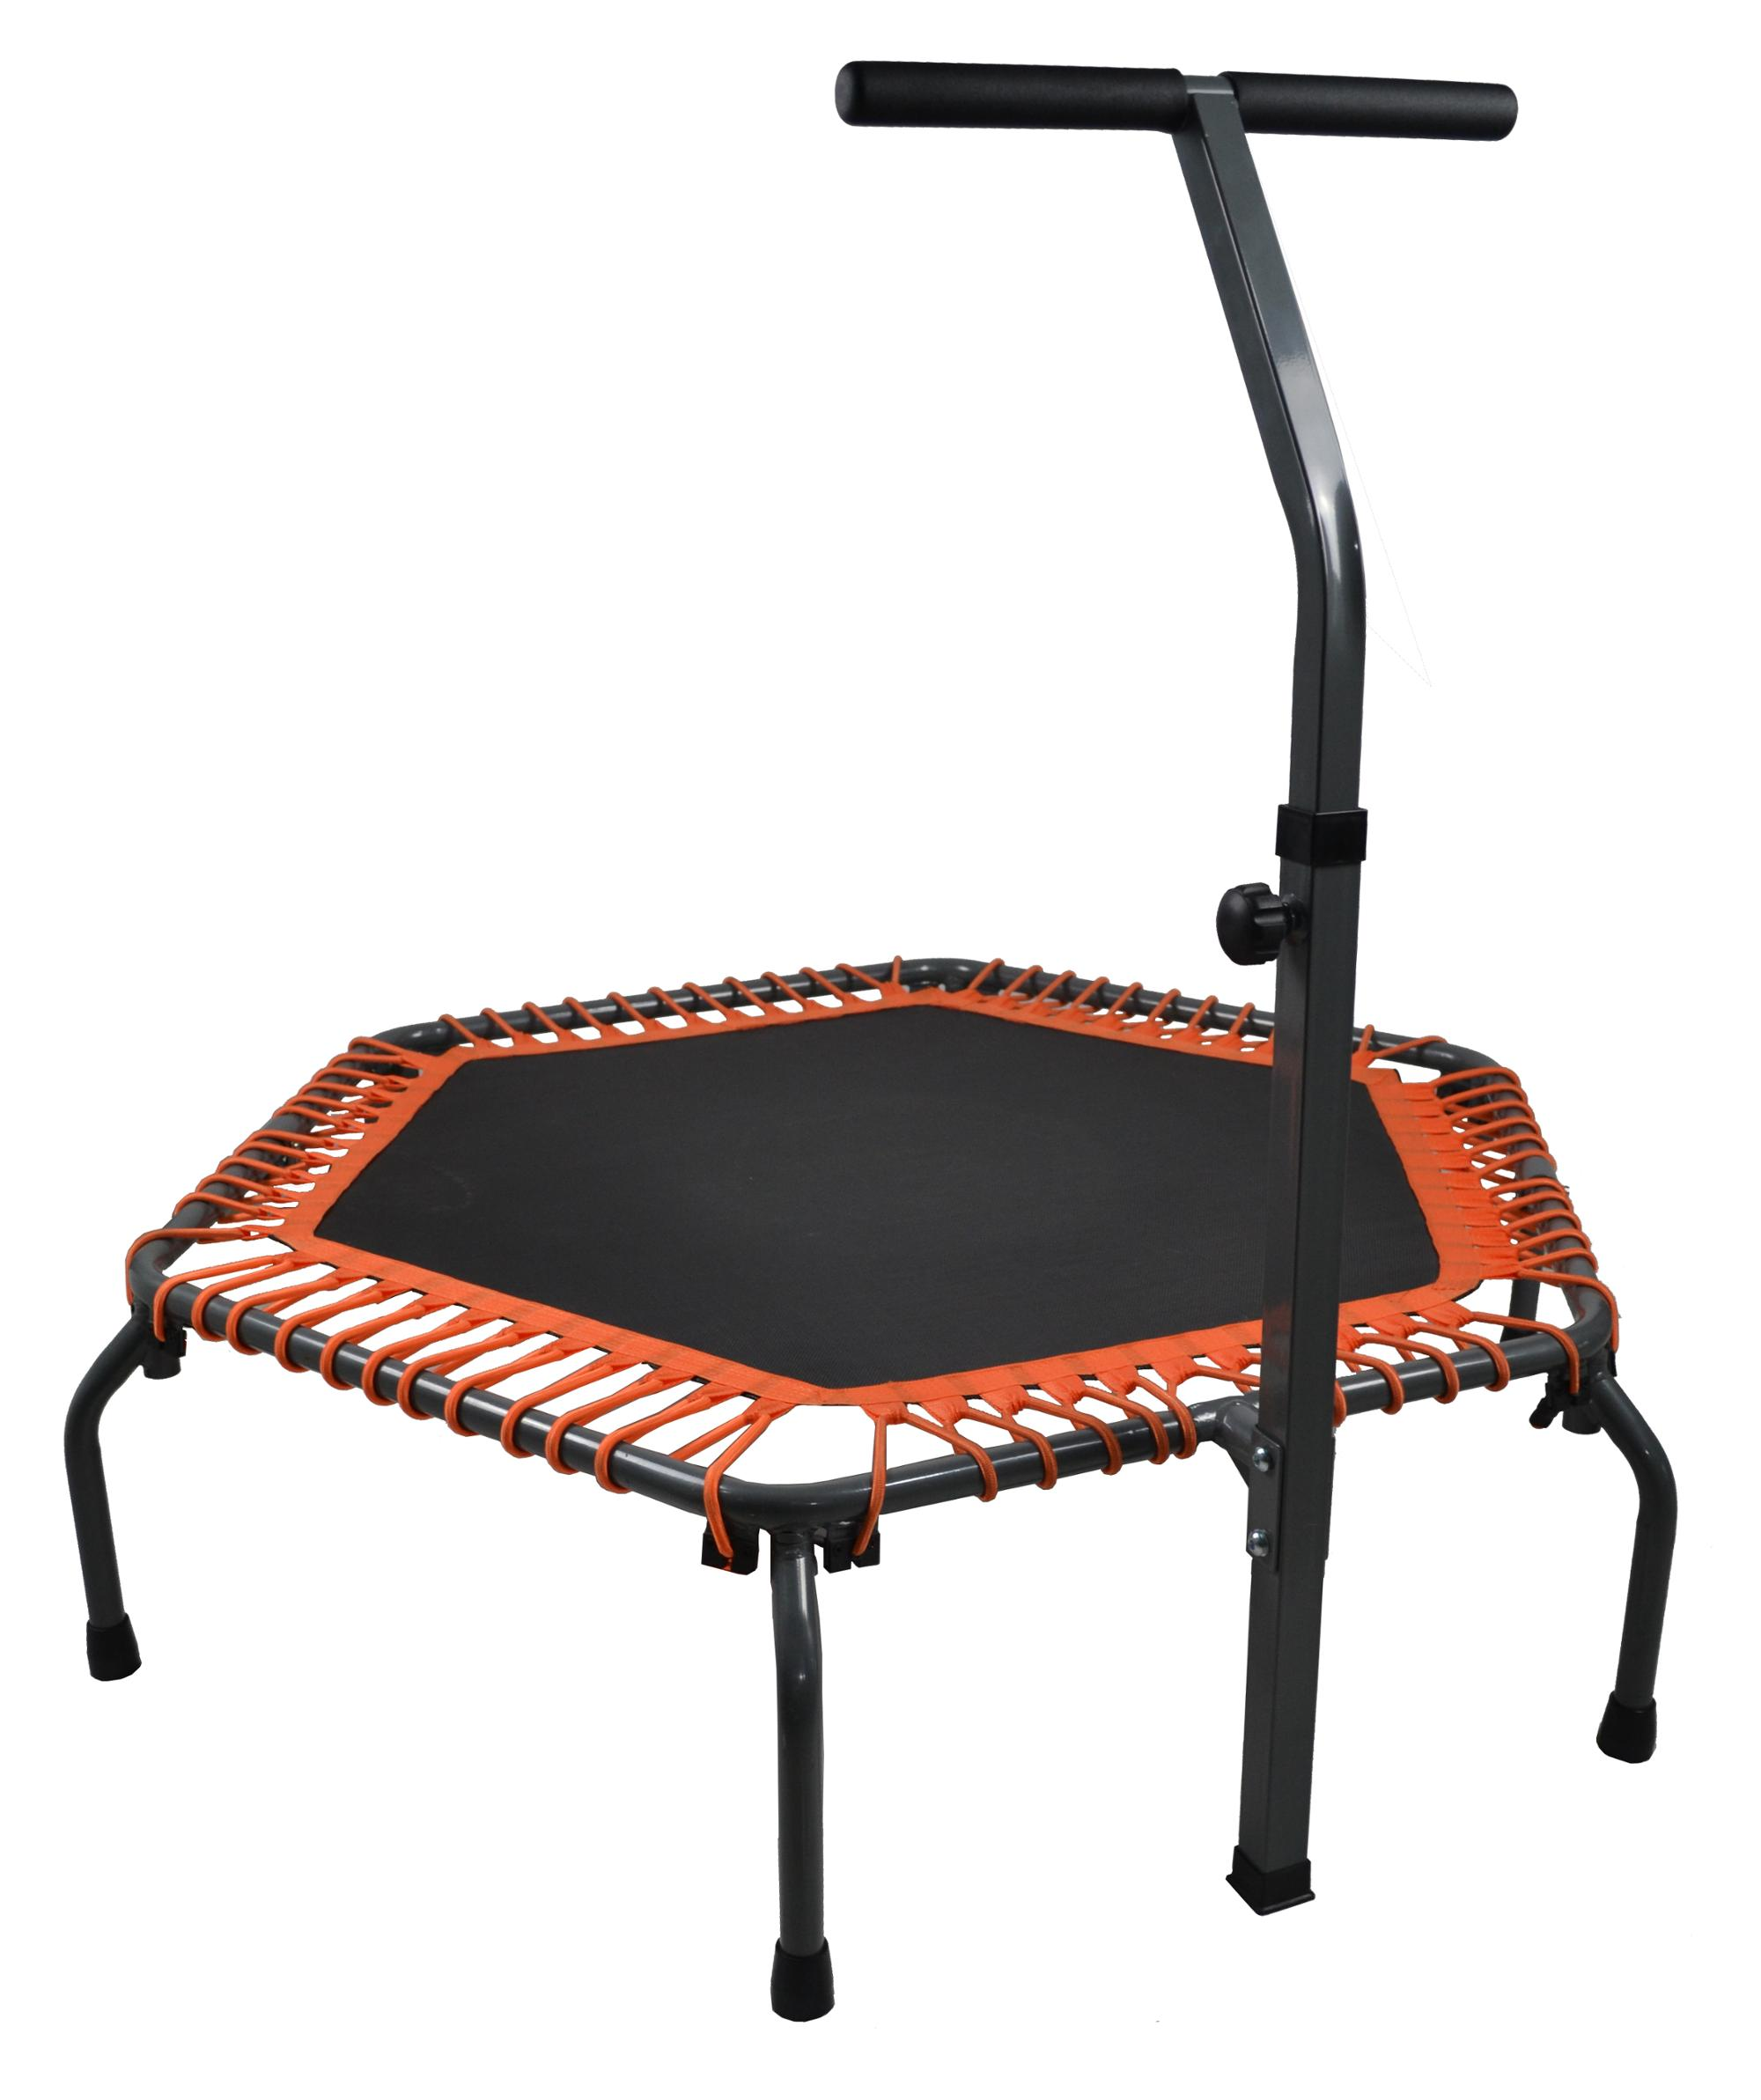 Bungee เชือก fitness hexagonal trampoline